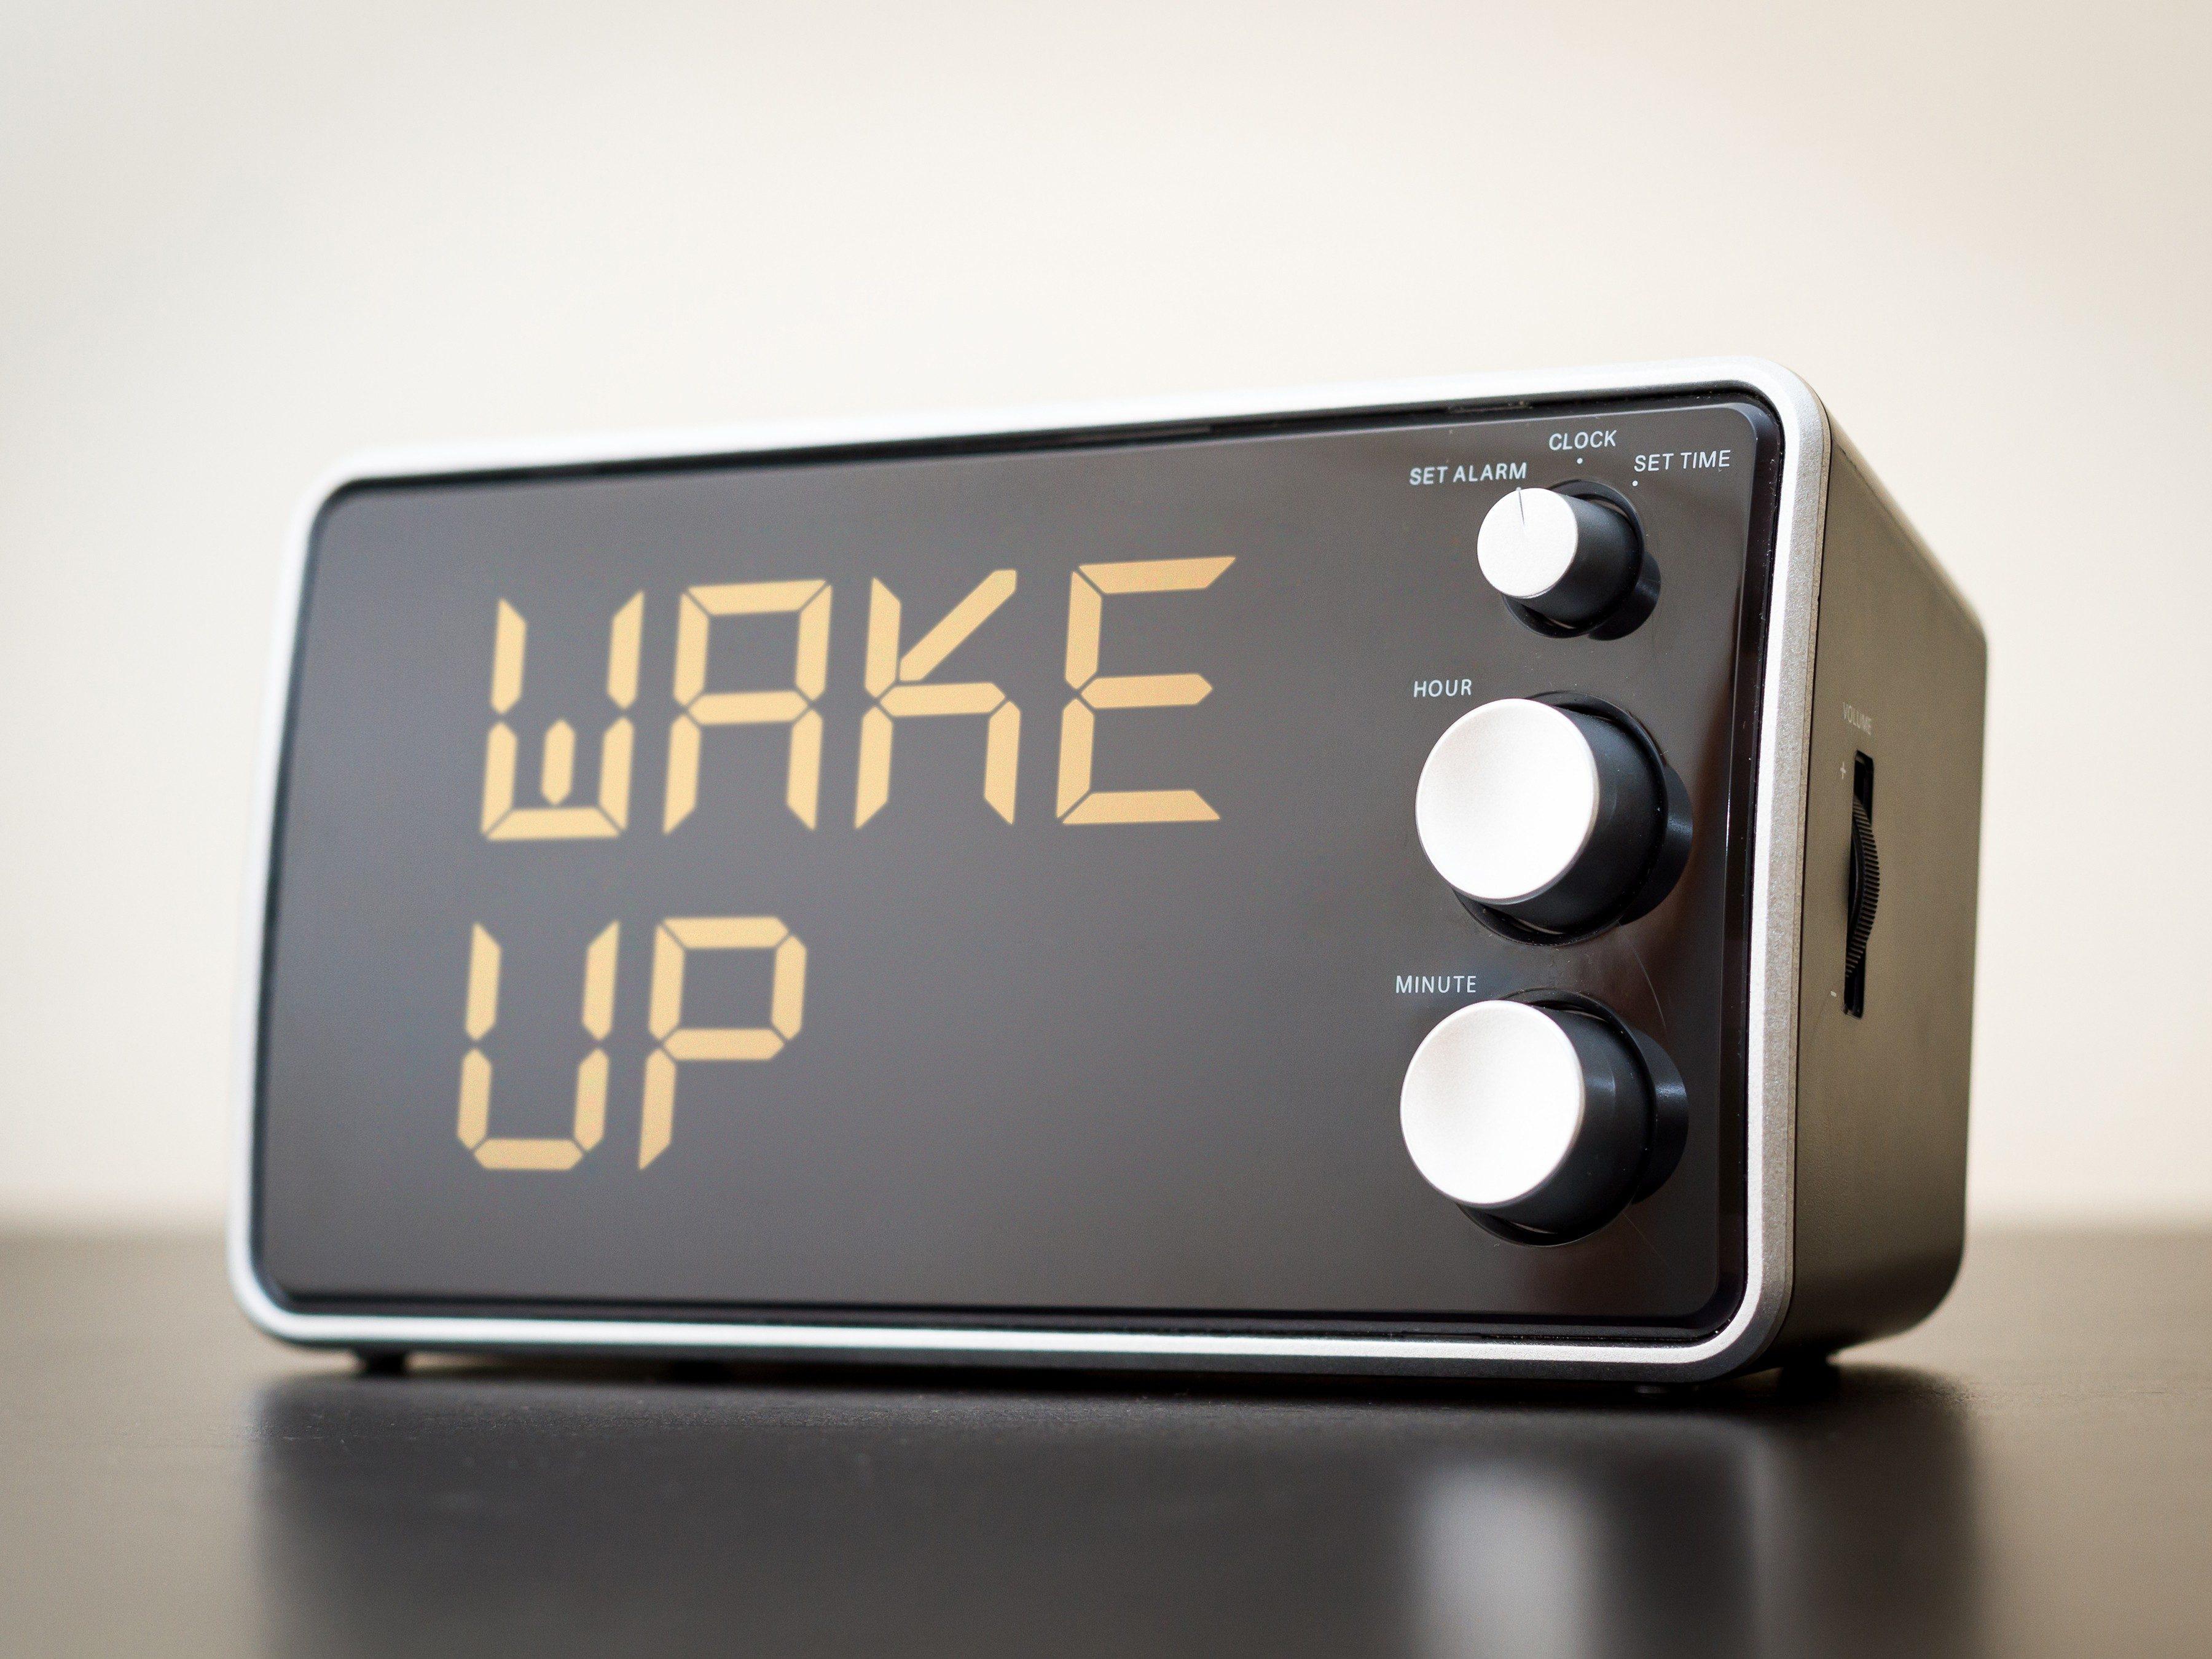 3. Get a better sleep by hiding the bedside clock